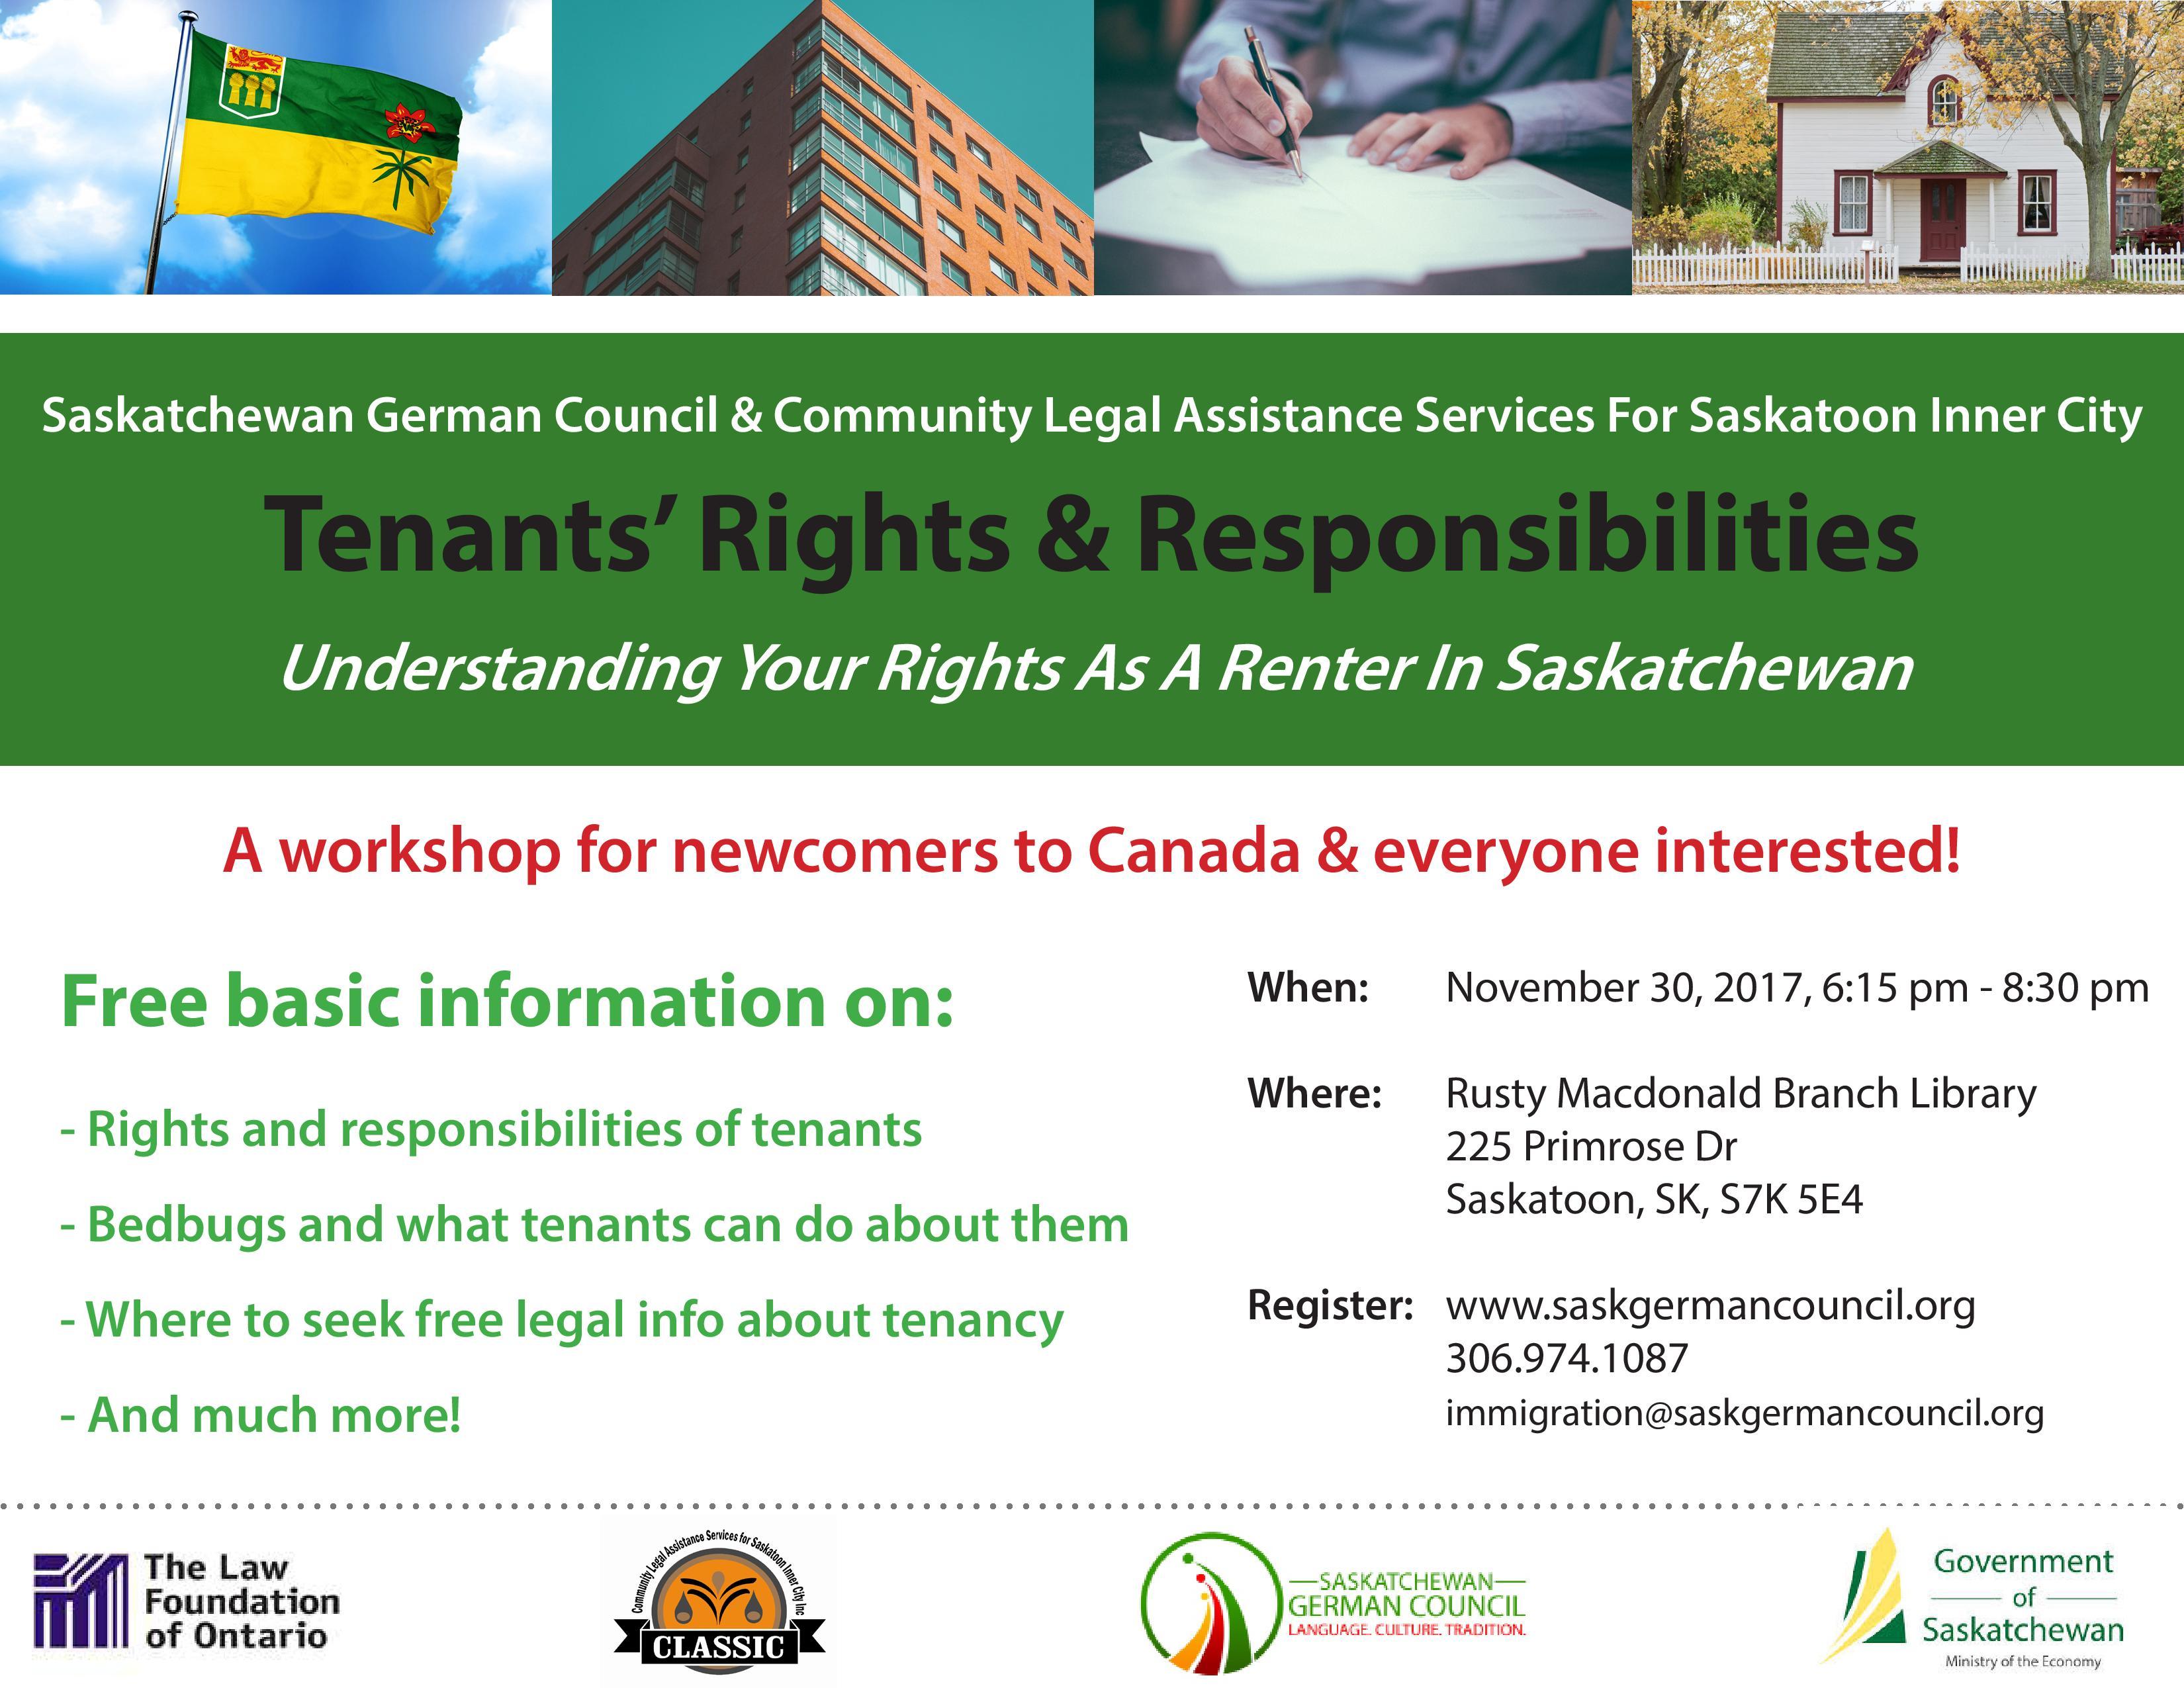 Tenants' Rights & Responsibilities